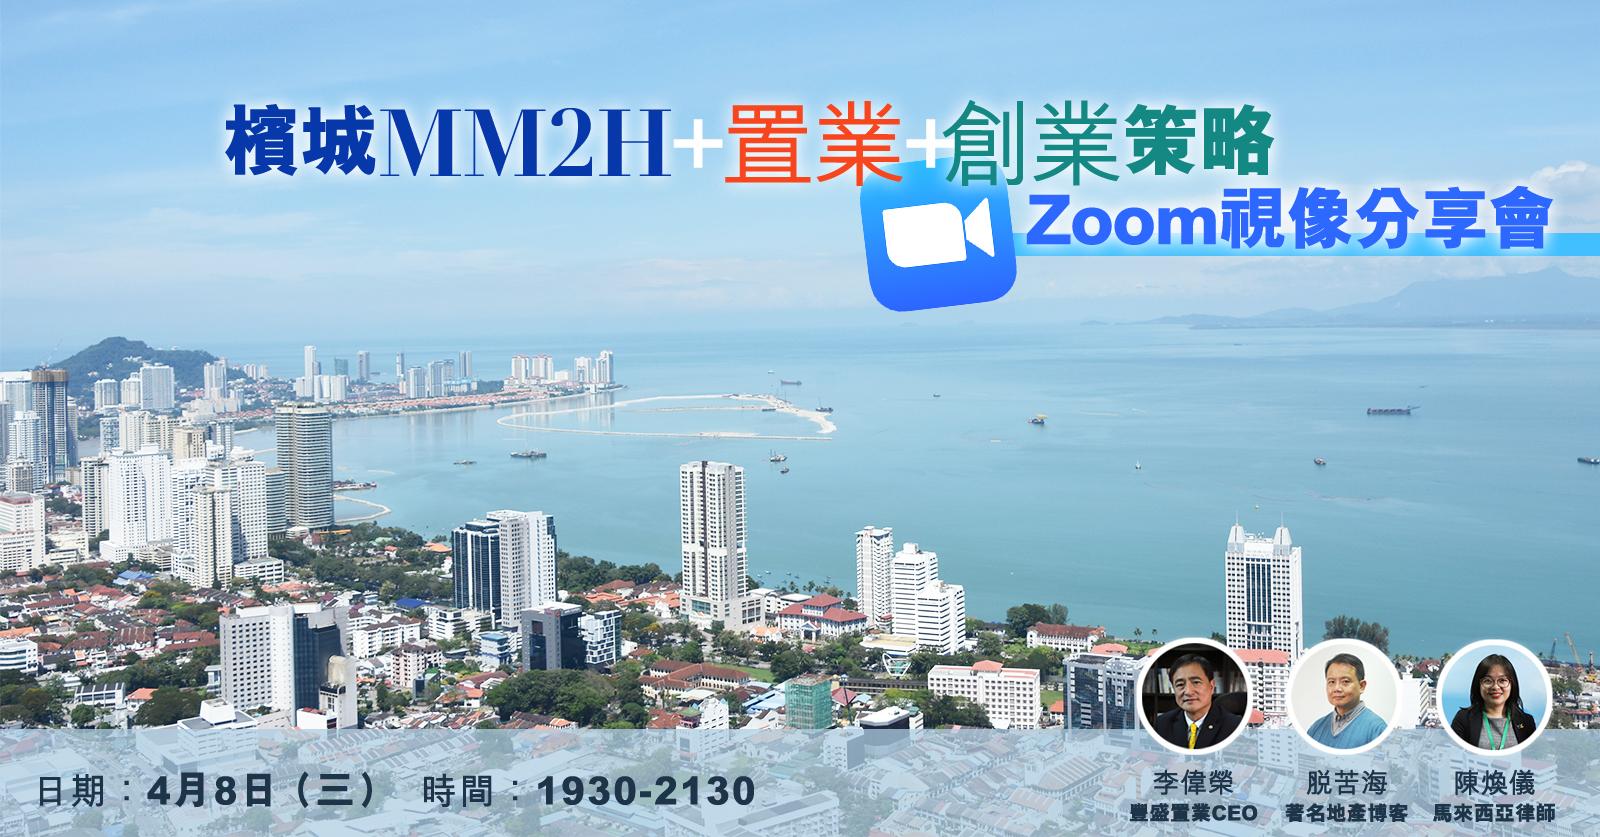 MM2H置業業策略